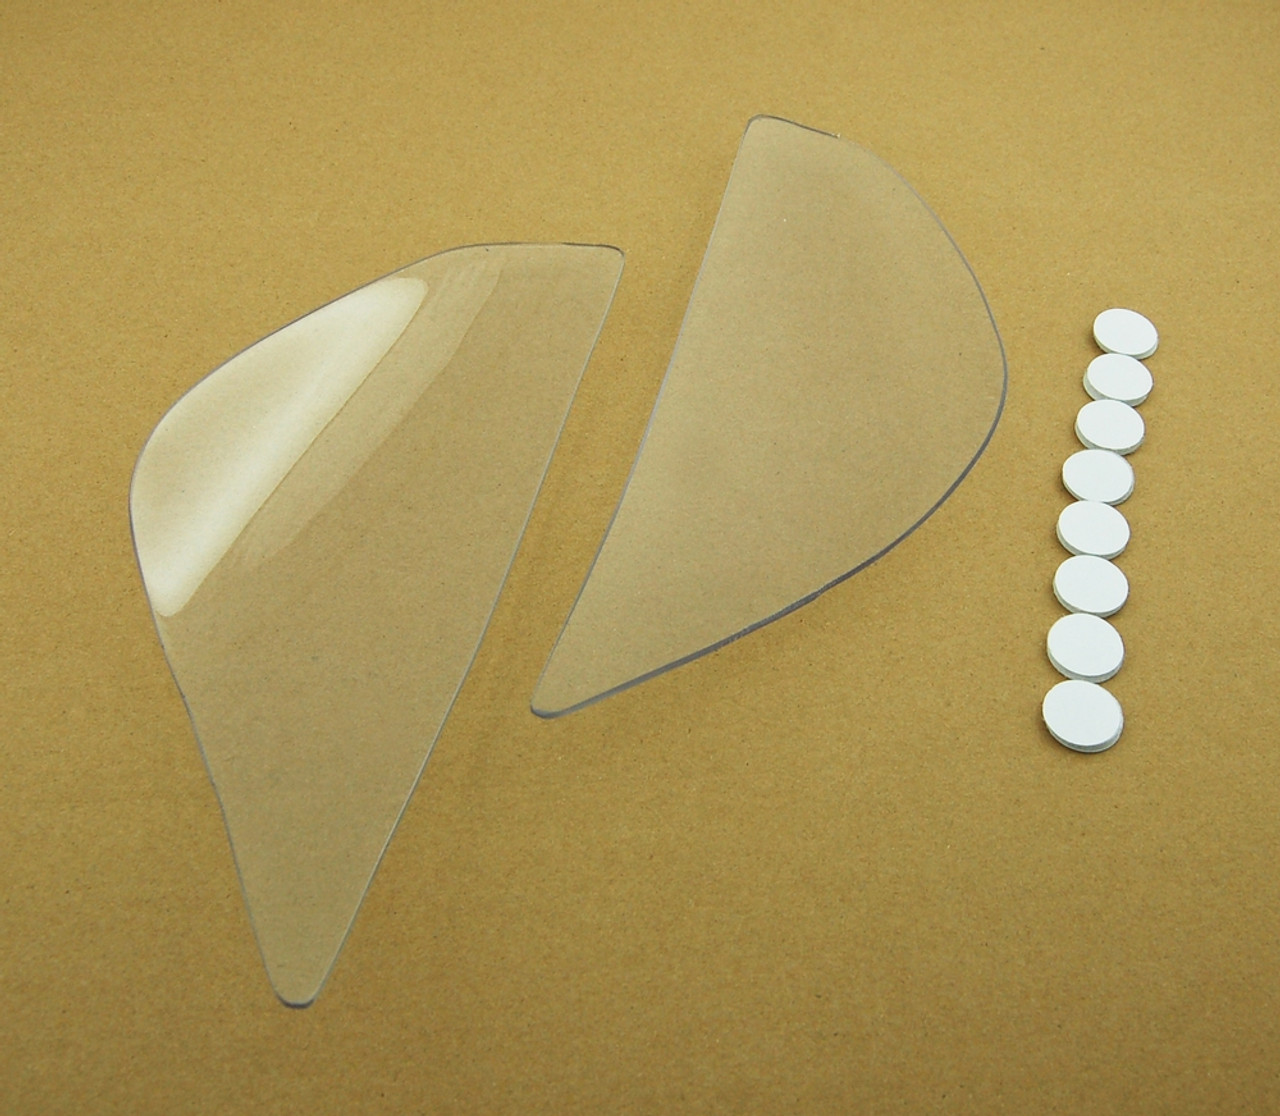 Headlight Lens Shield Cover for Kawasaki ZX 6R (2005-2006) Clear